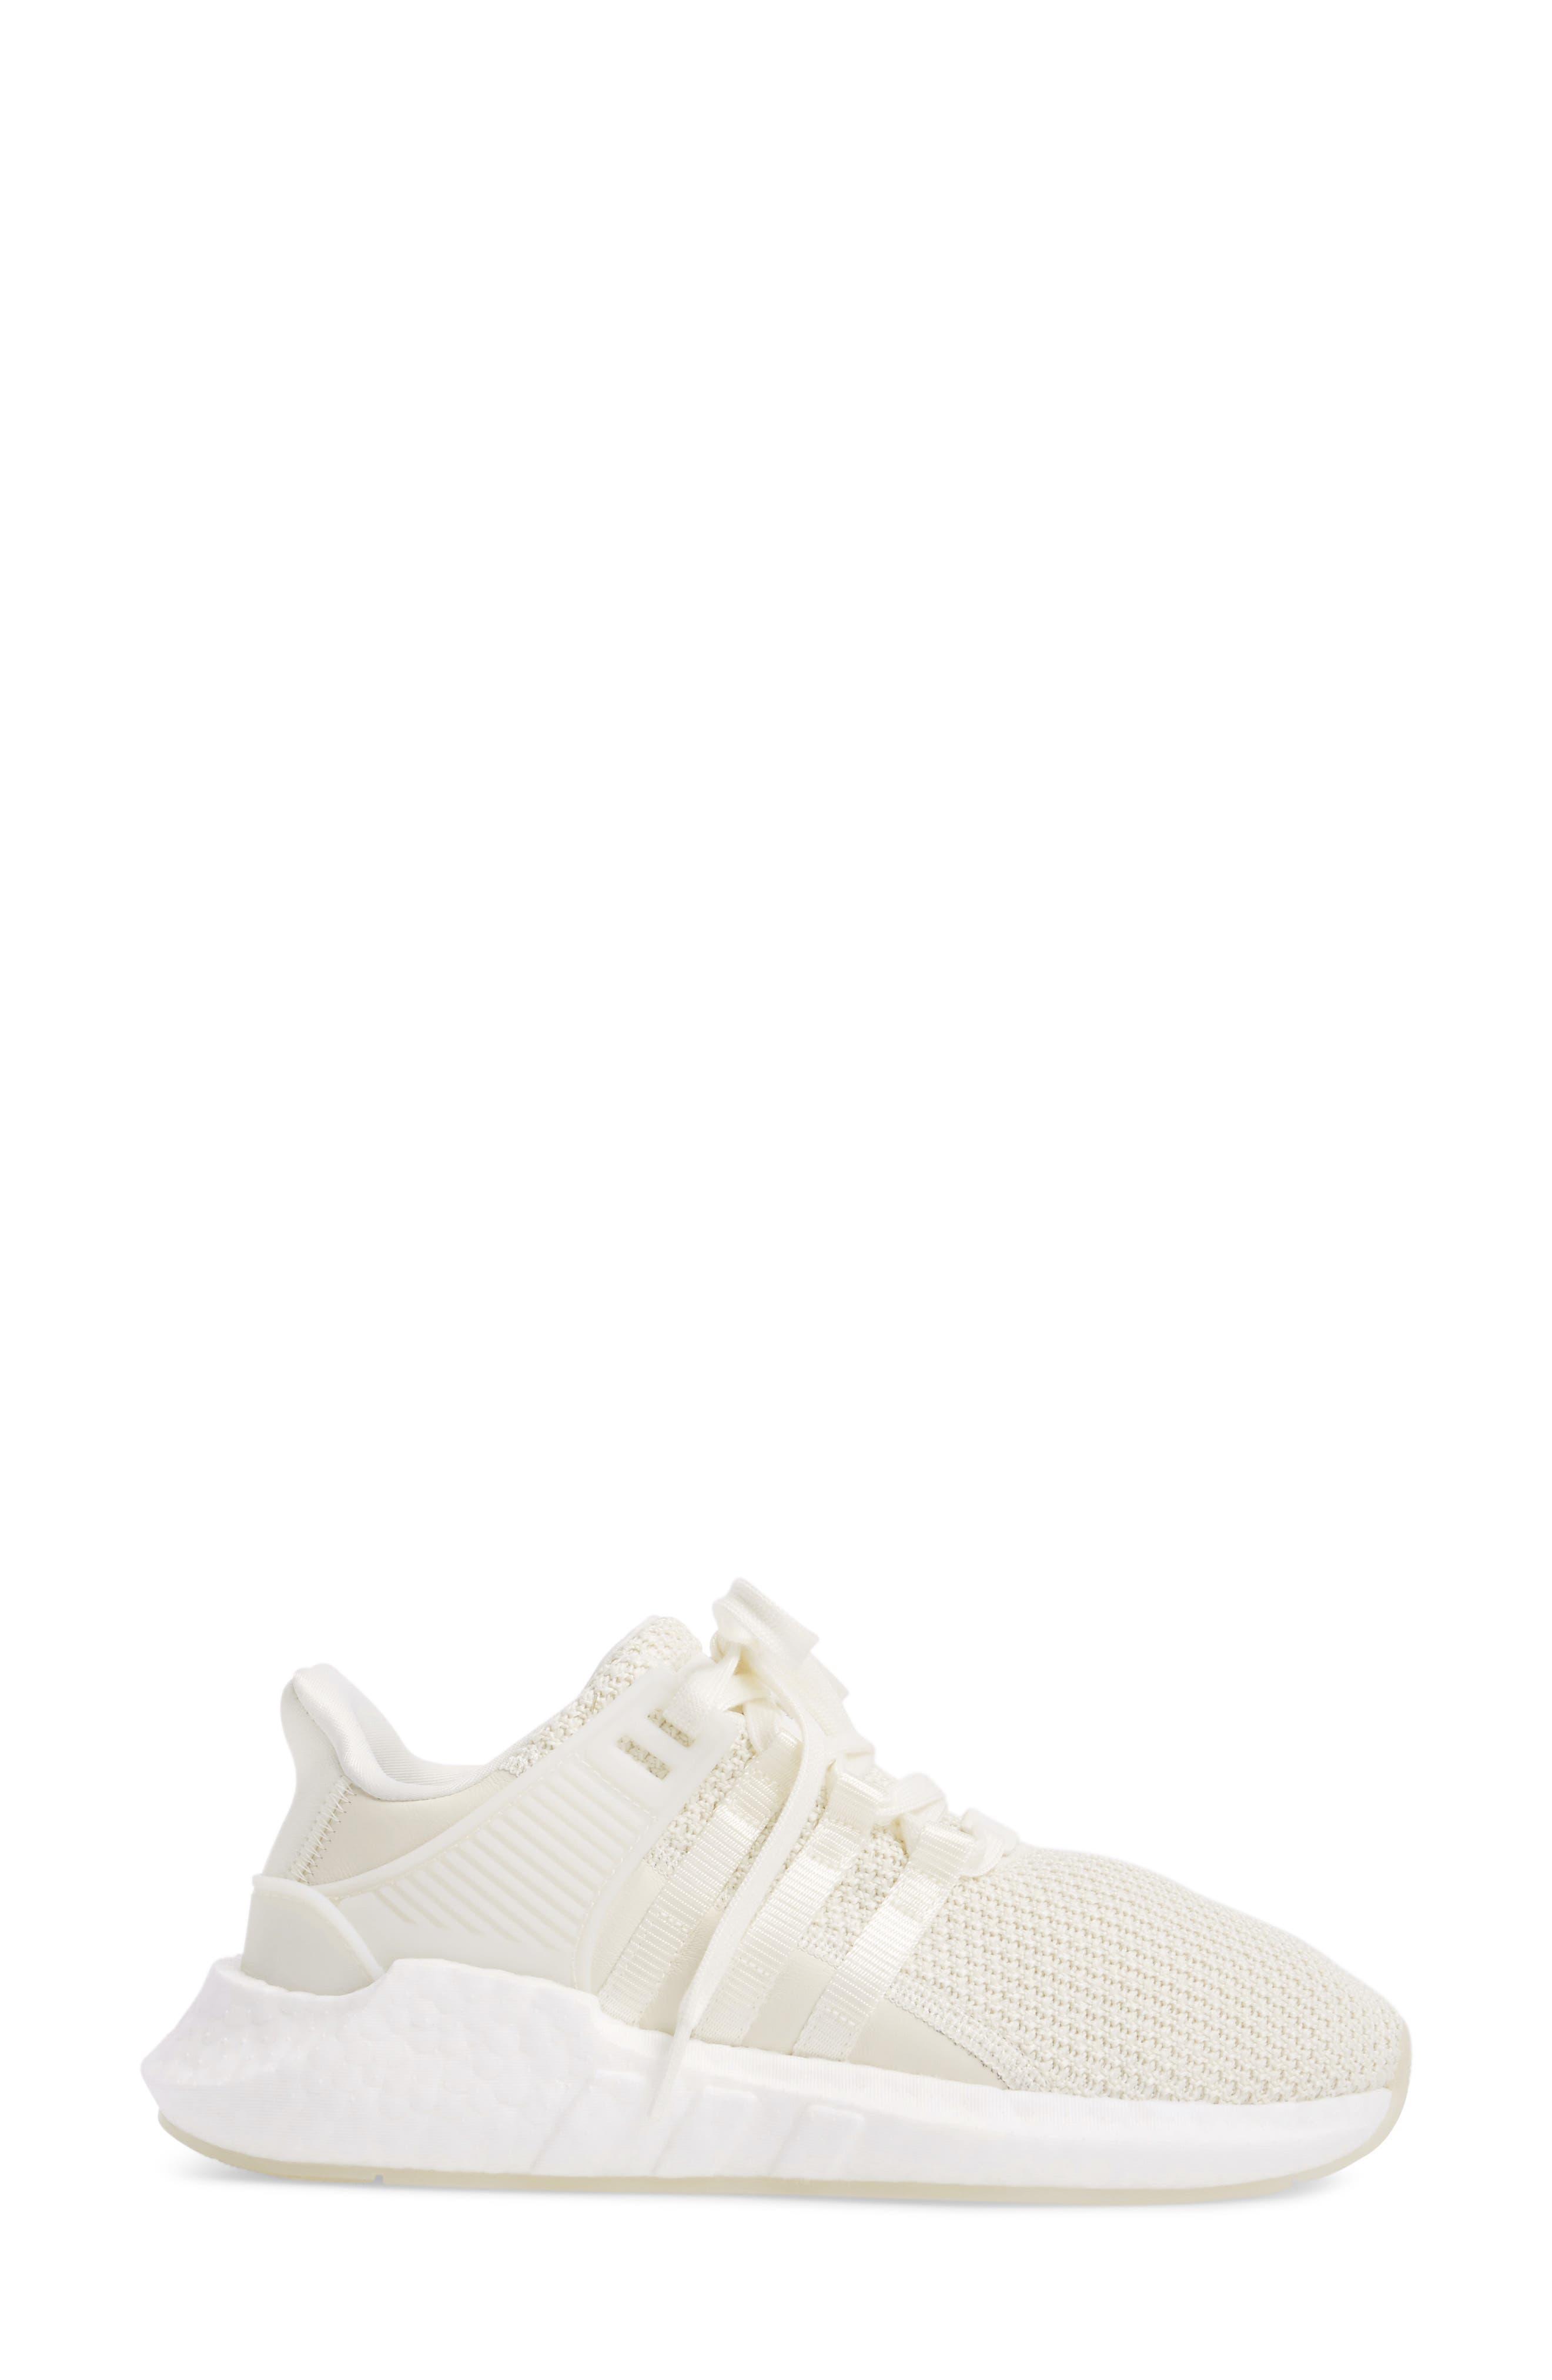 EQT Support 93/17 Sneaker,                             Alternate thumbnail 17, color,